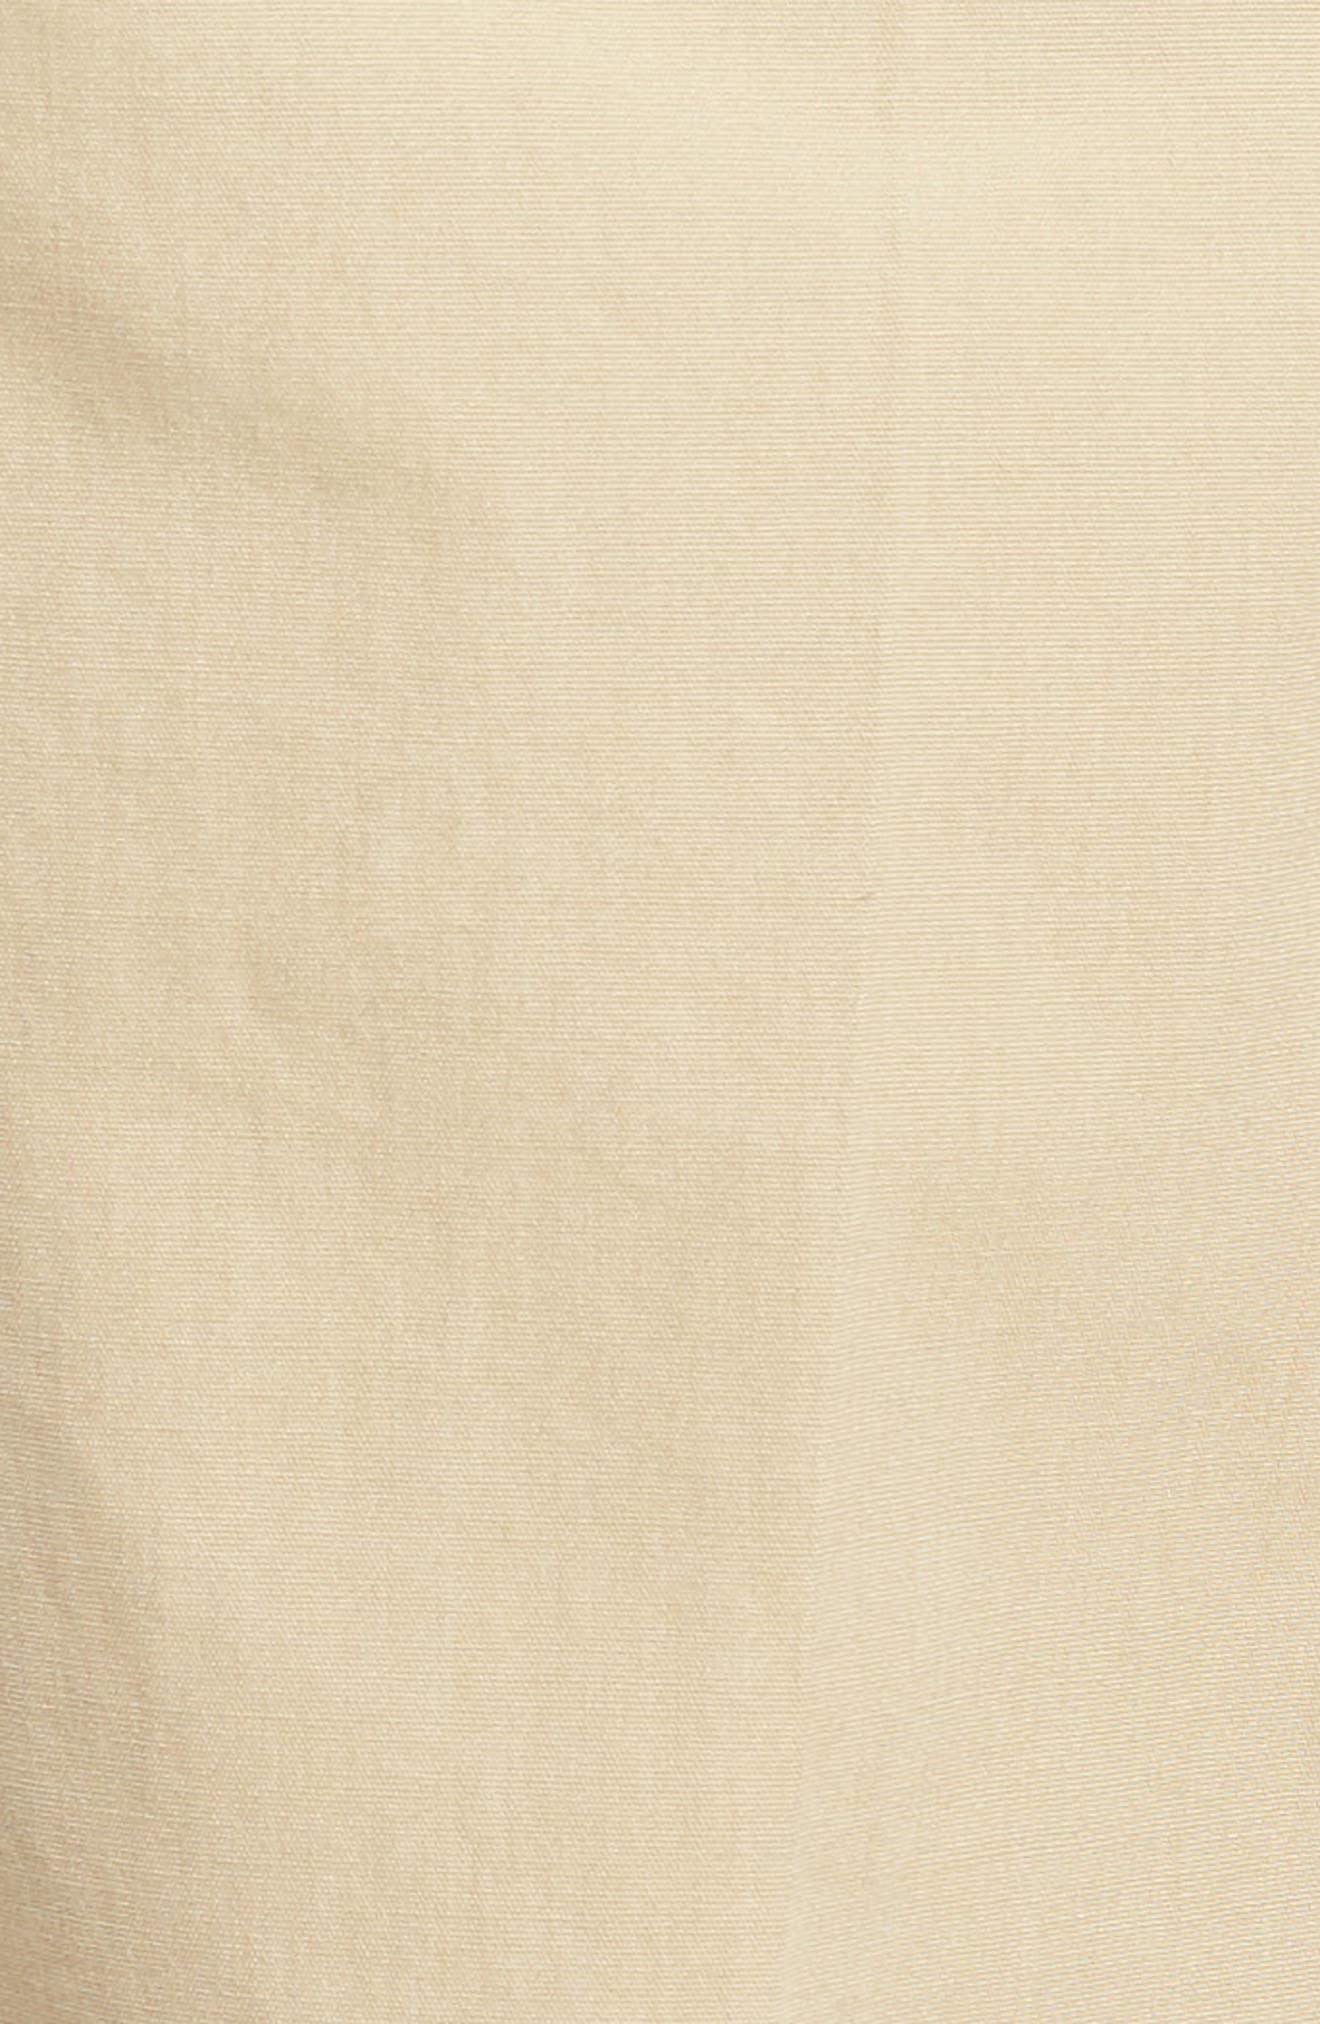 M3 Straight Fit Flat Front Tropical Poplin Pants,                             Alternate thumbnail 5, color,                             Khaki